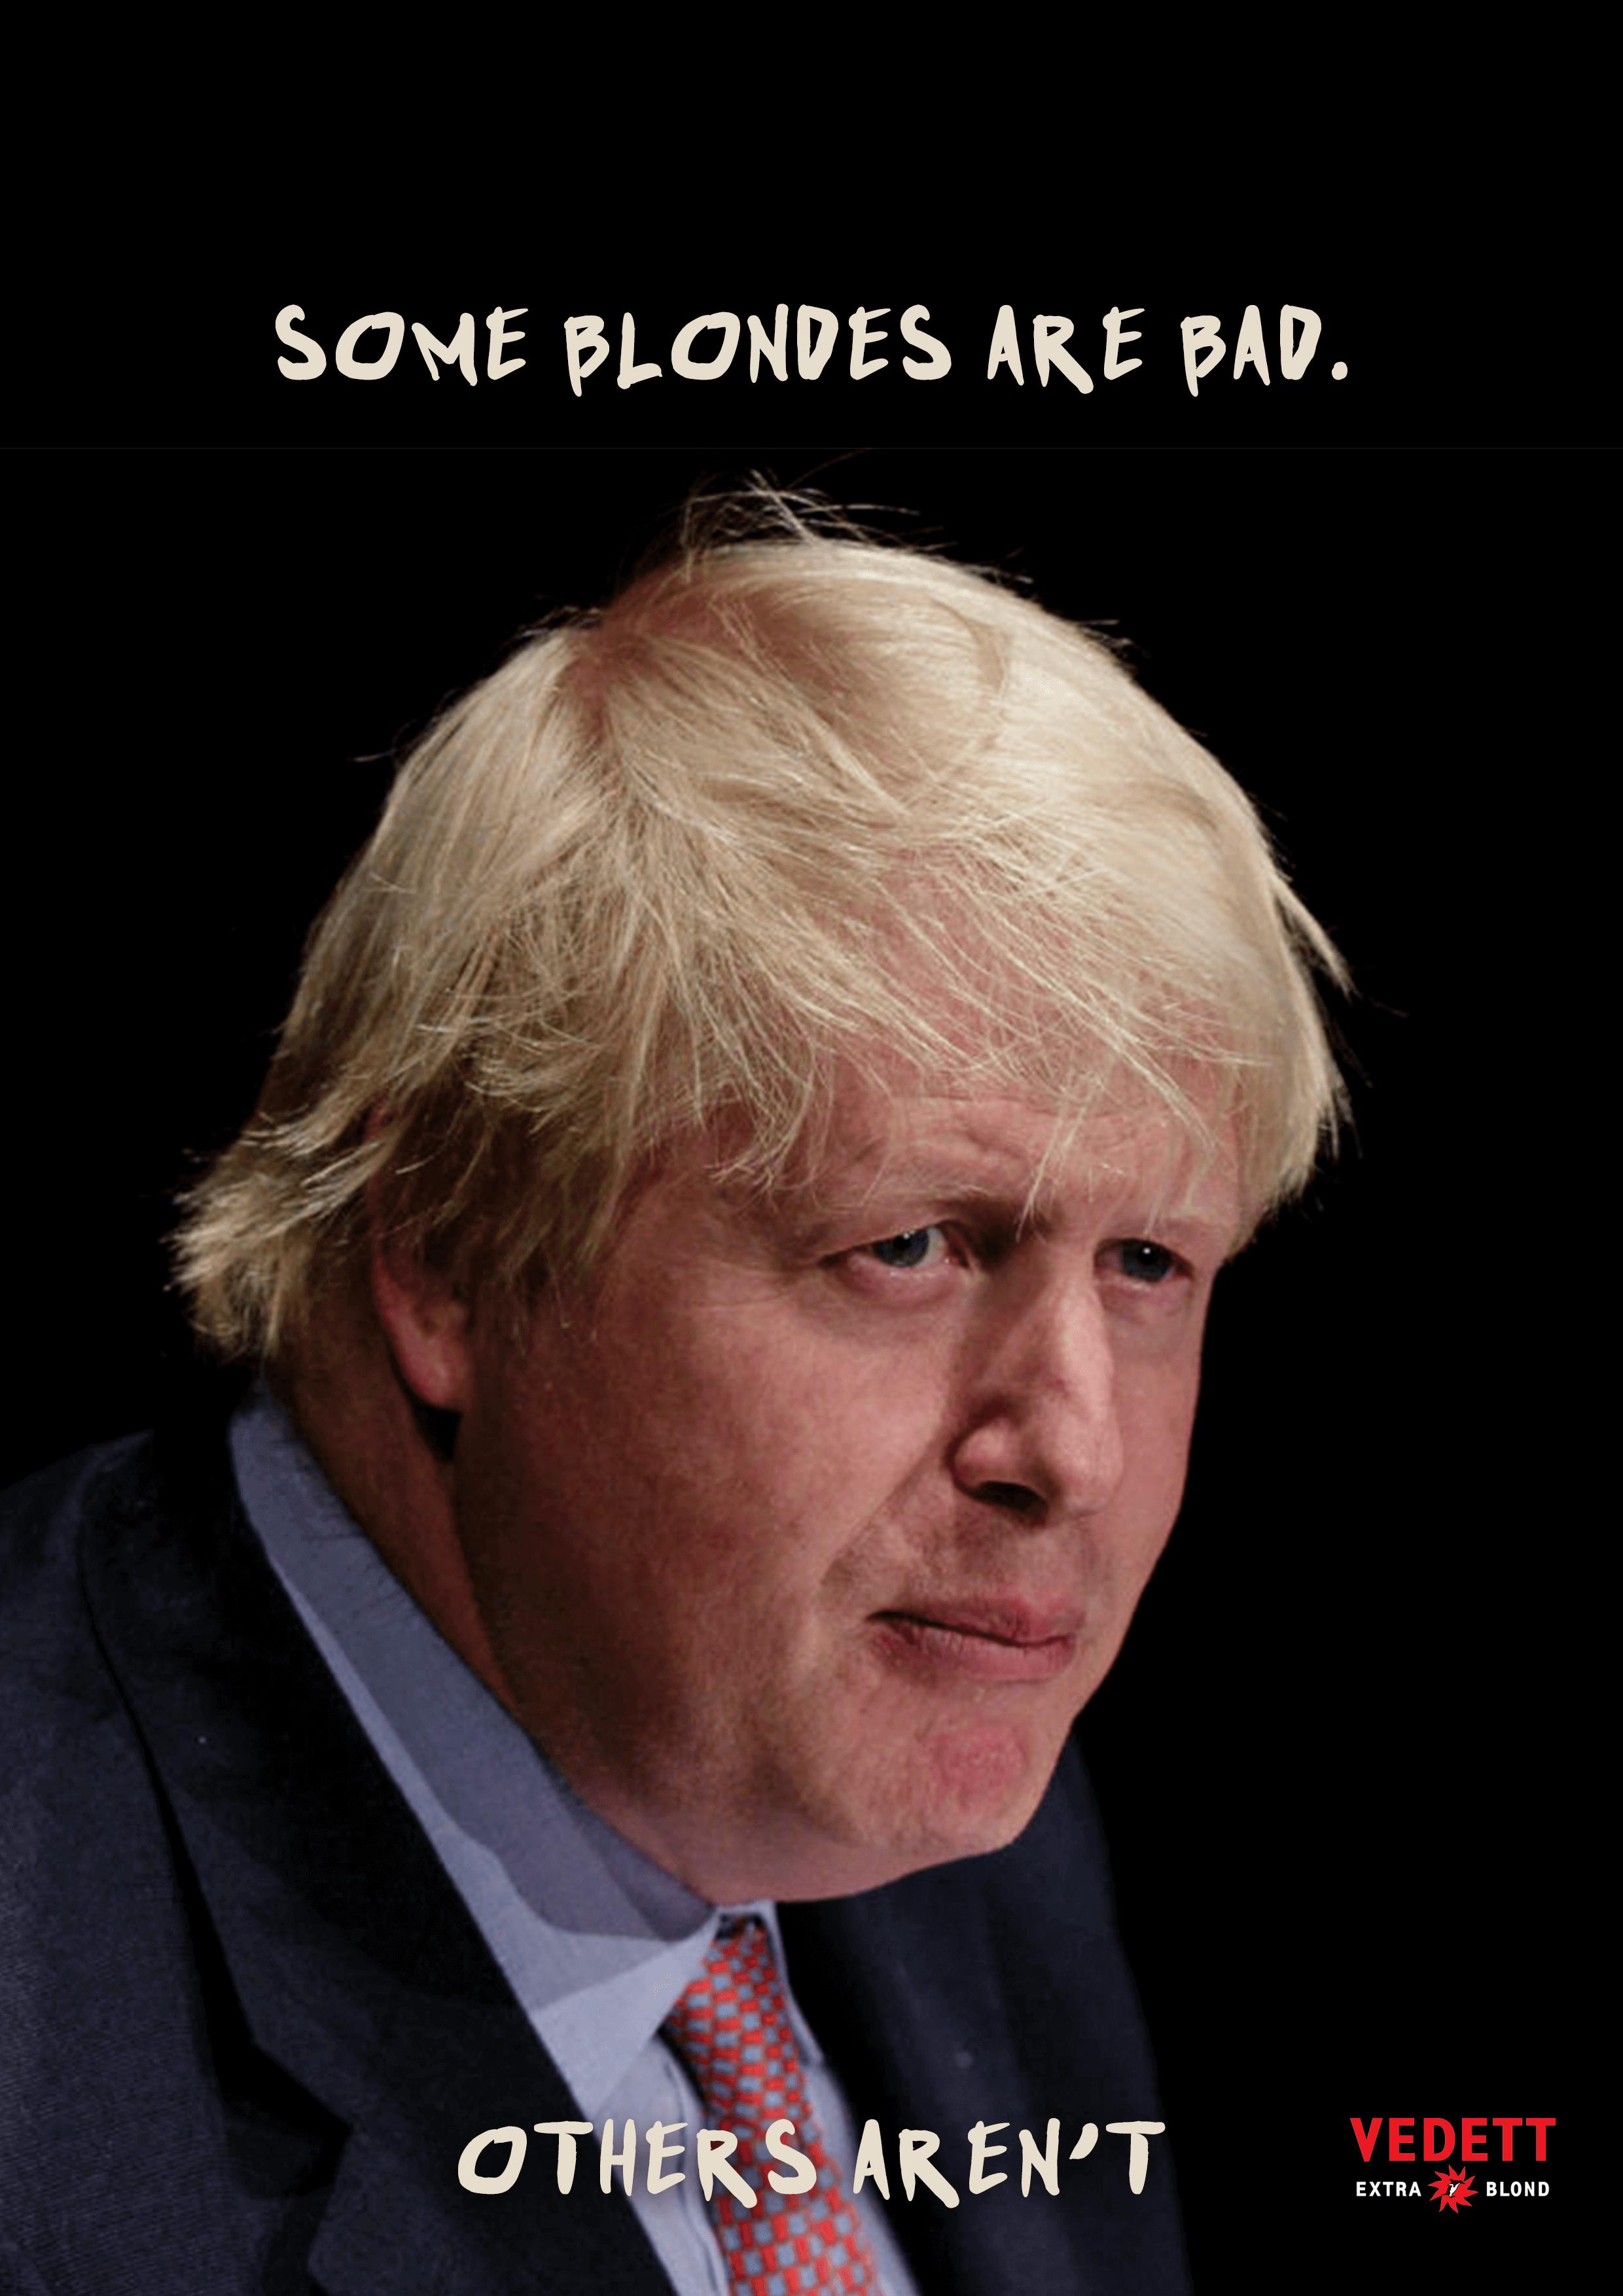 Blonde Boris Johnson